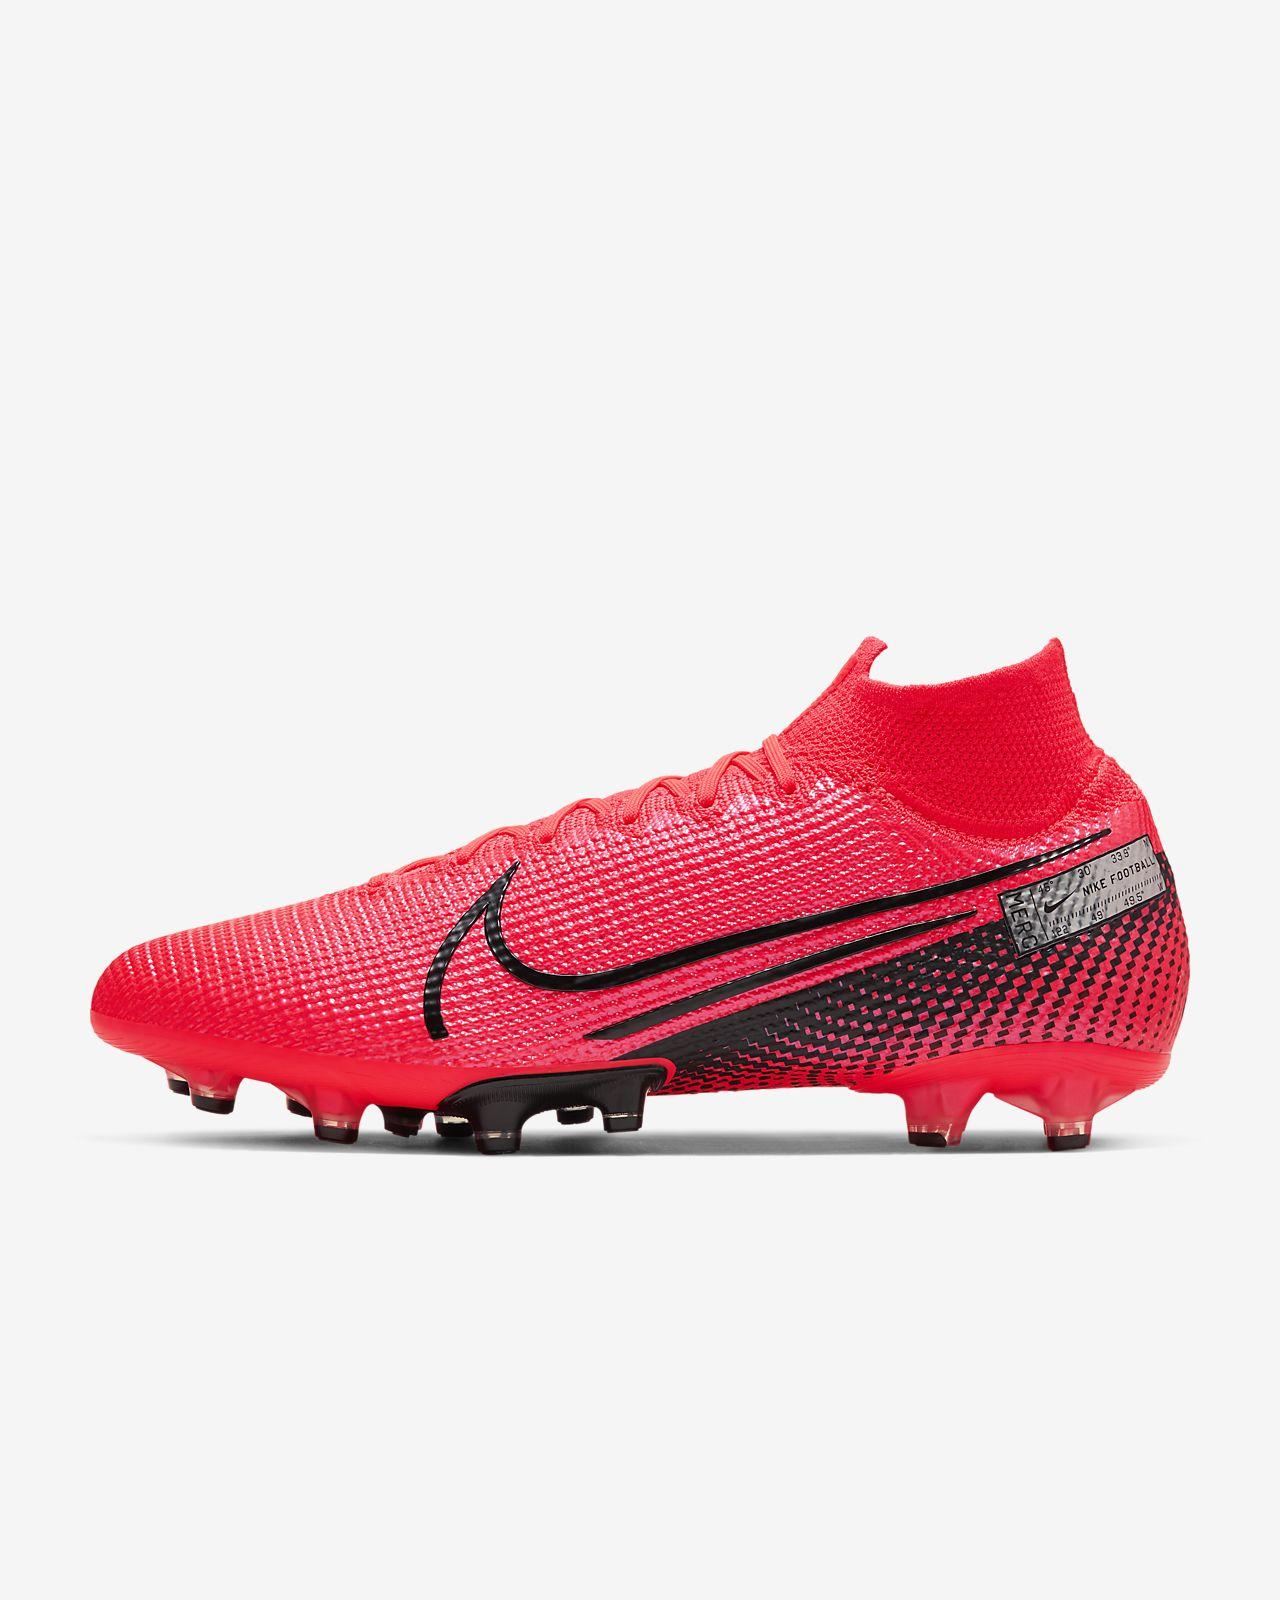 Nike Mercurial Superfly 7 Elite AG-PRO Fußballschuh für Kunstrasen